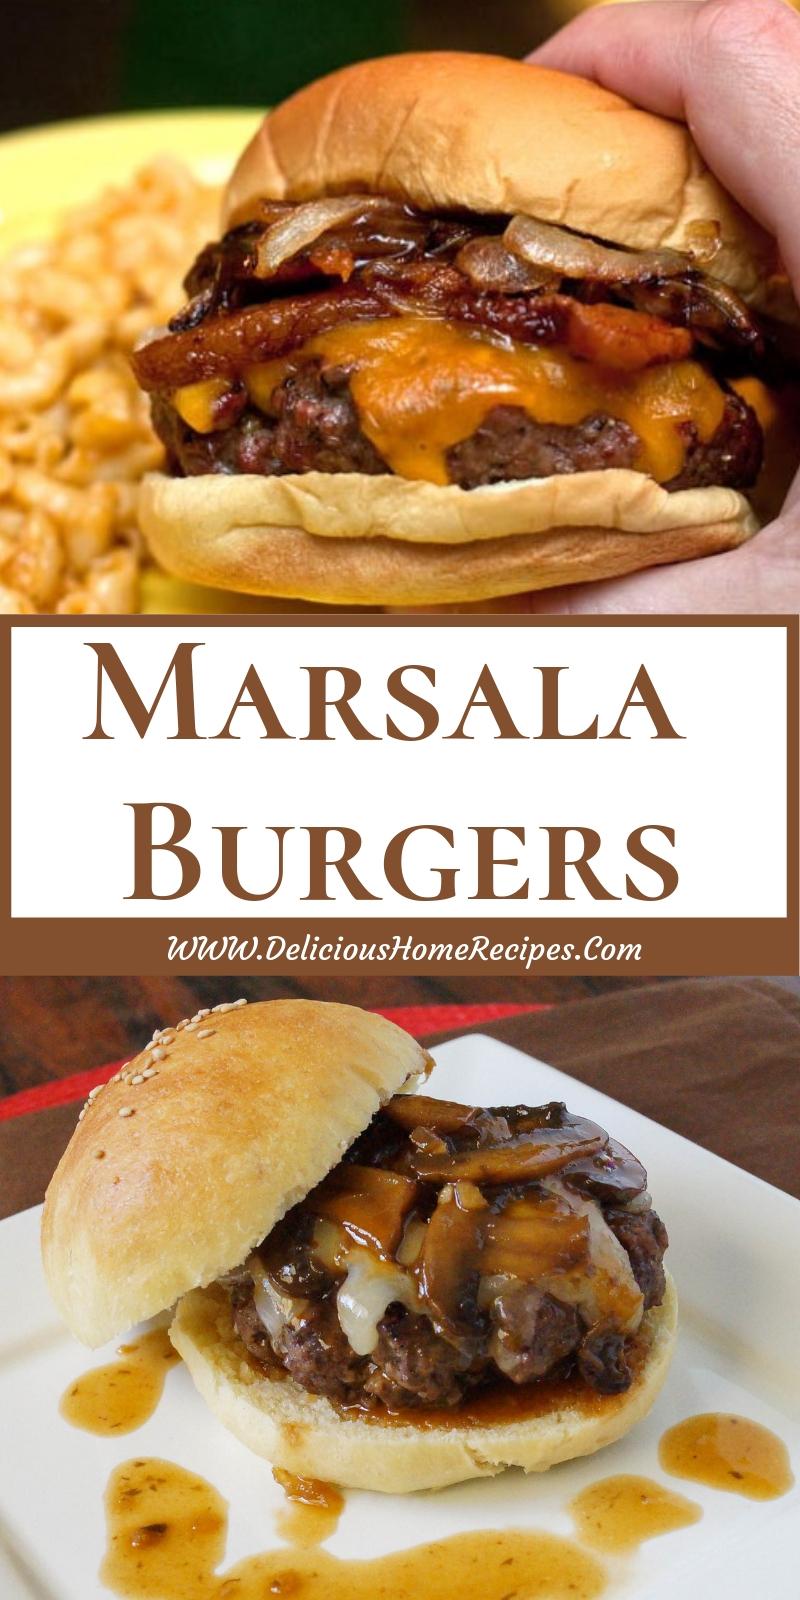 Marsala Burgers